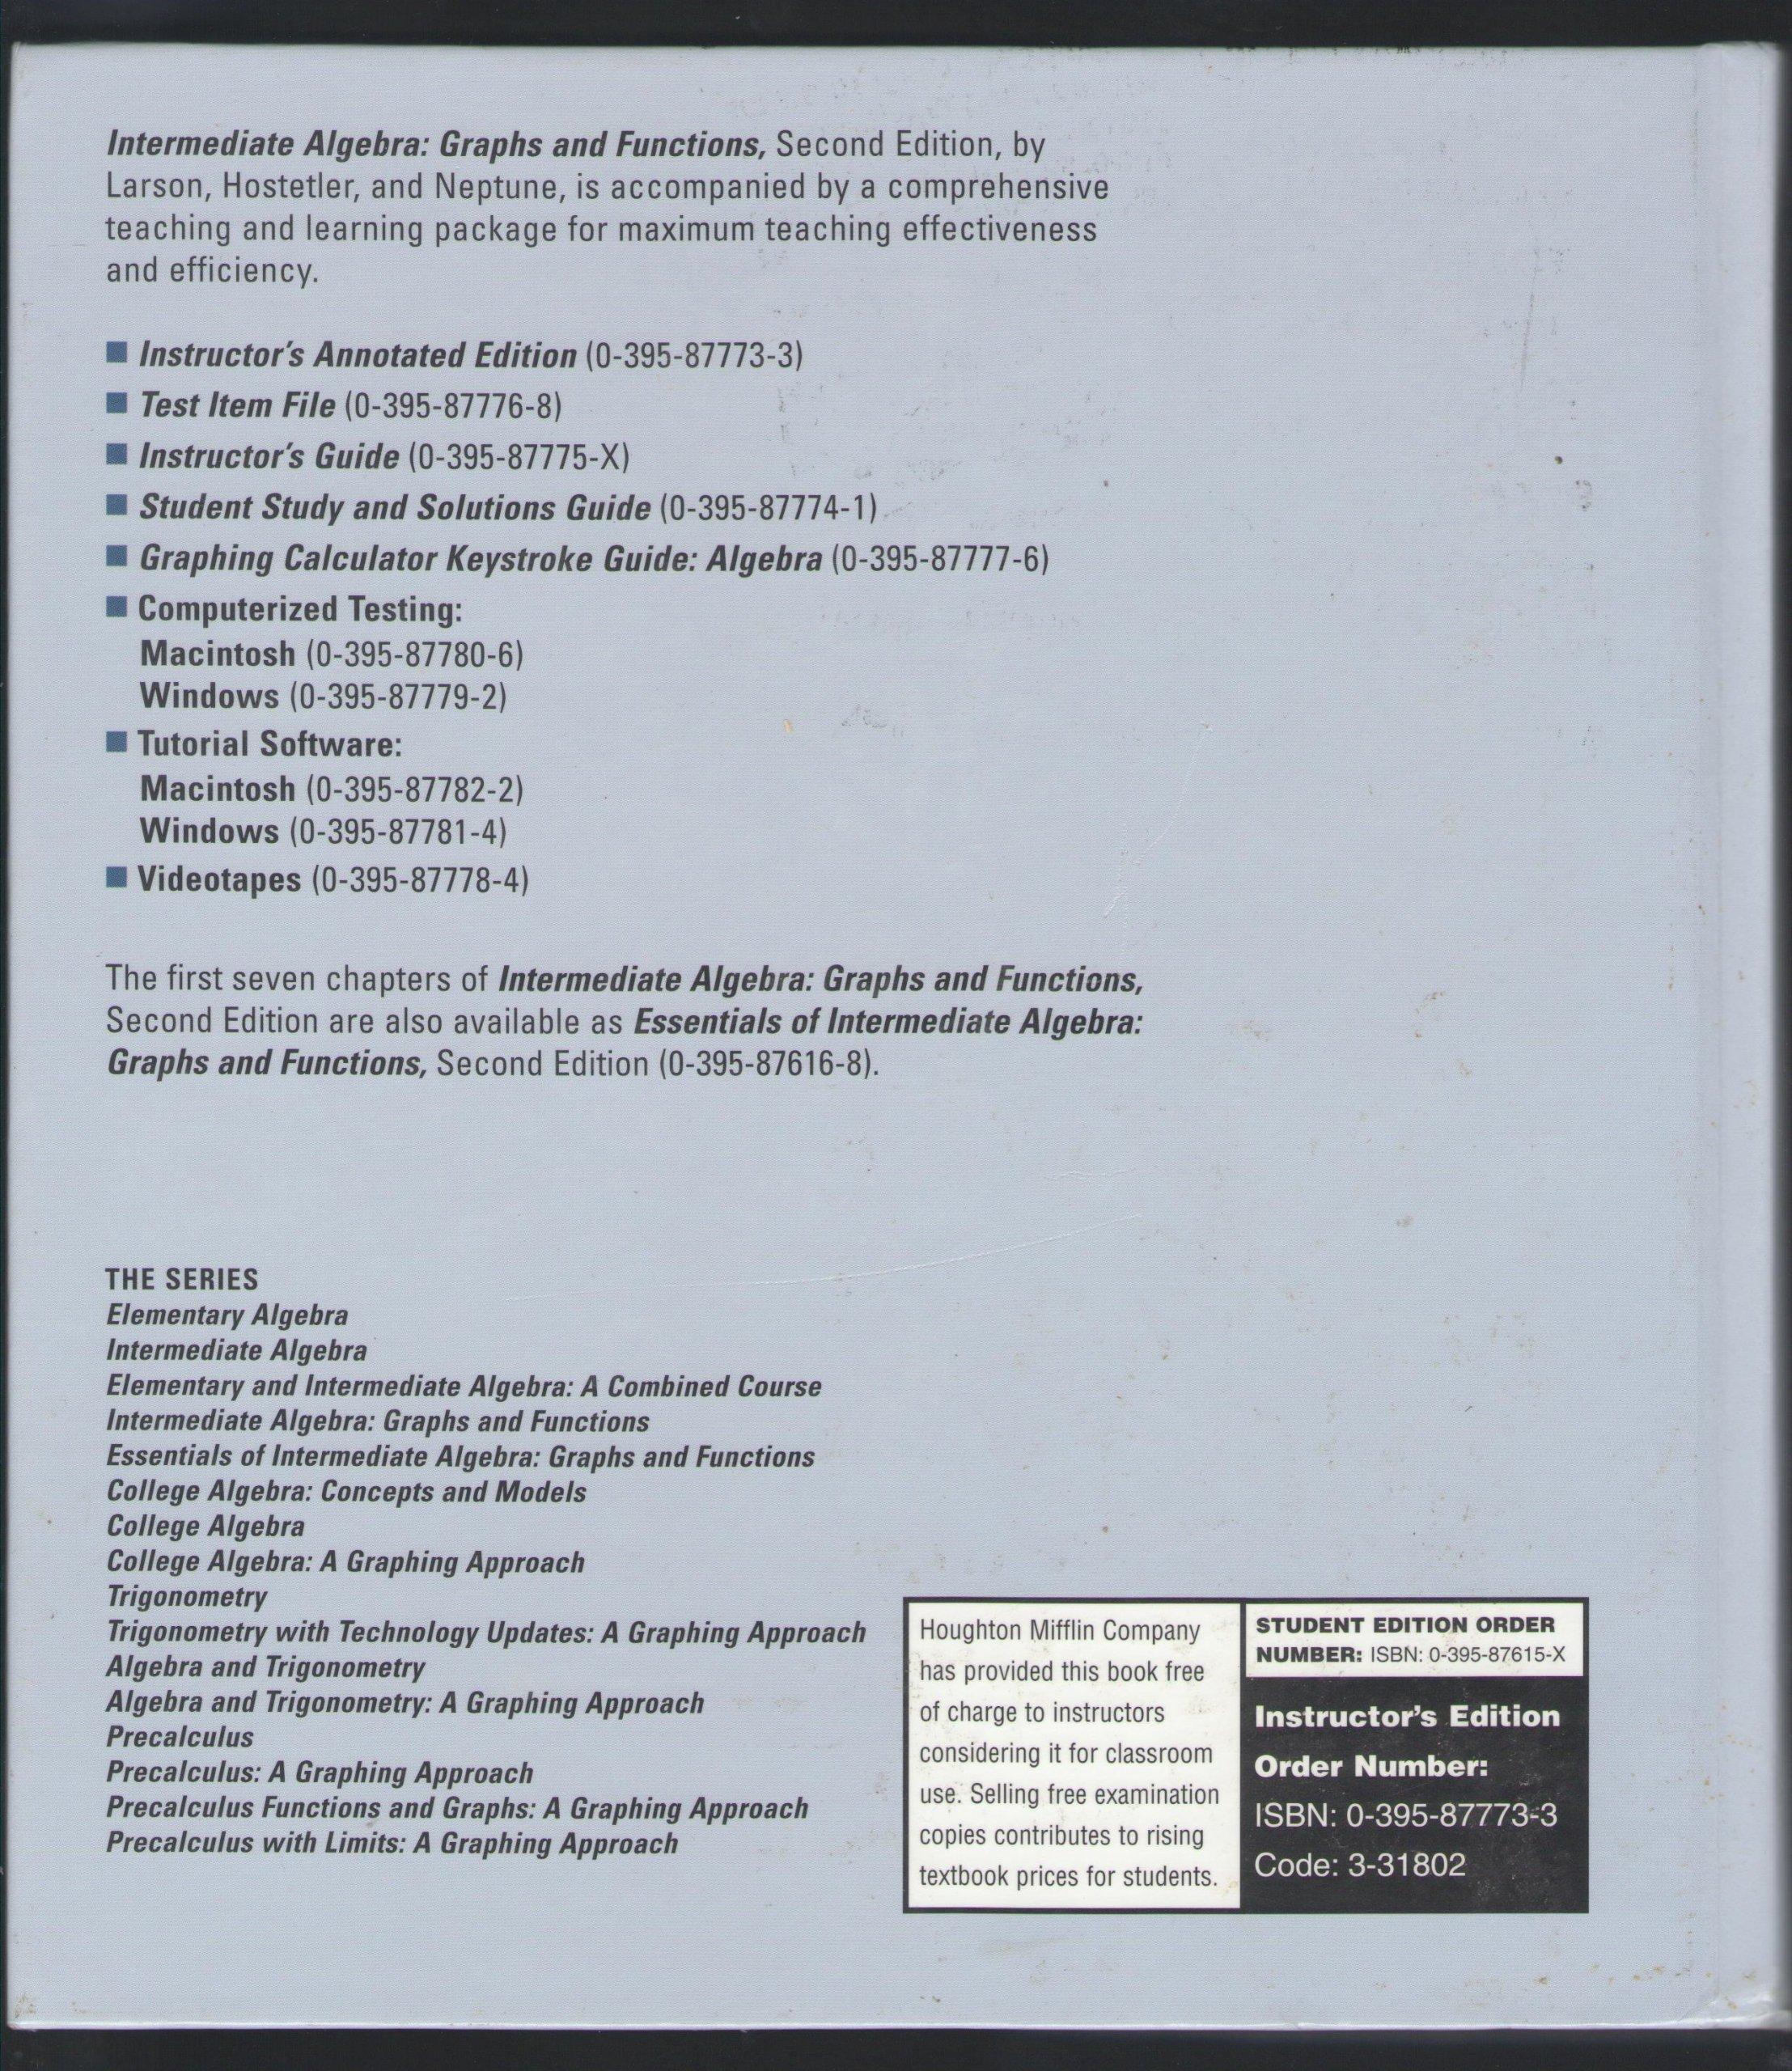 Intermediate Algebra: Graphs and Functions (instructor's annotated  edition): Sandra P Clarkson & Barbara J Barone: 9780395879511: Amazon.com:  Books